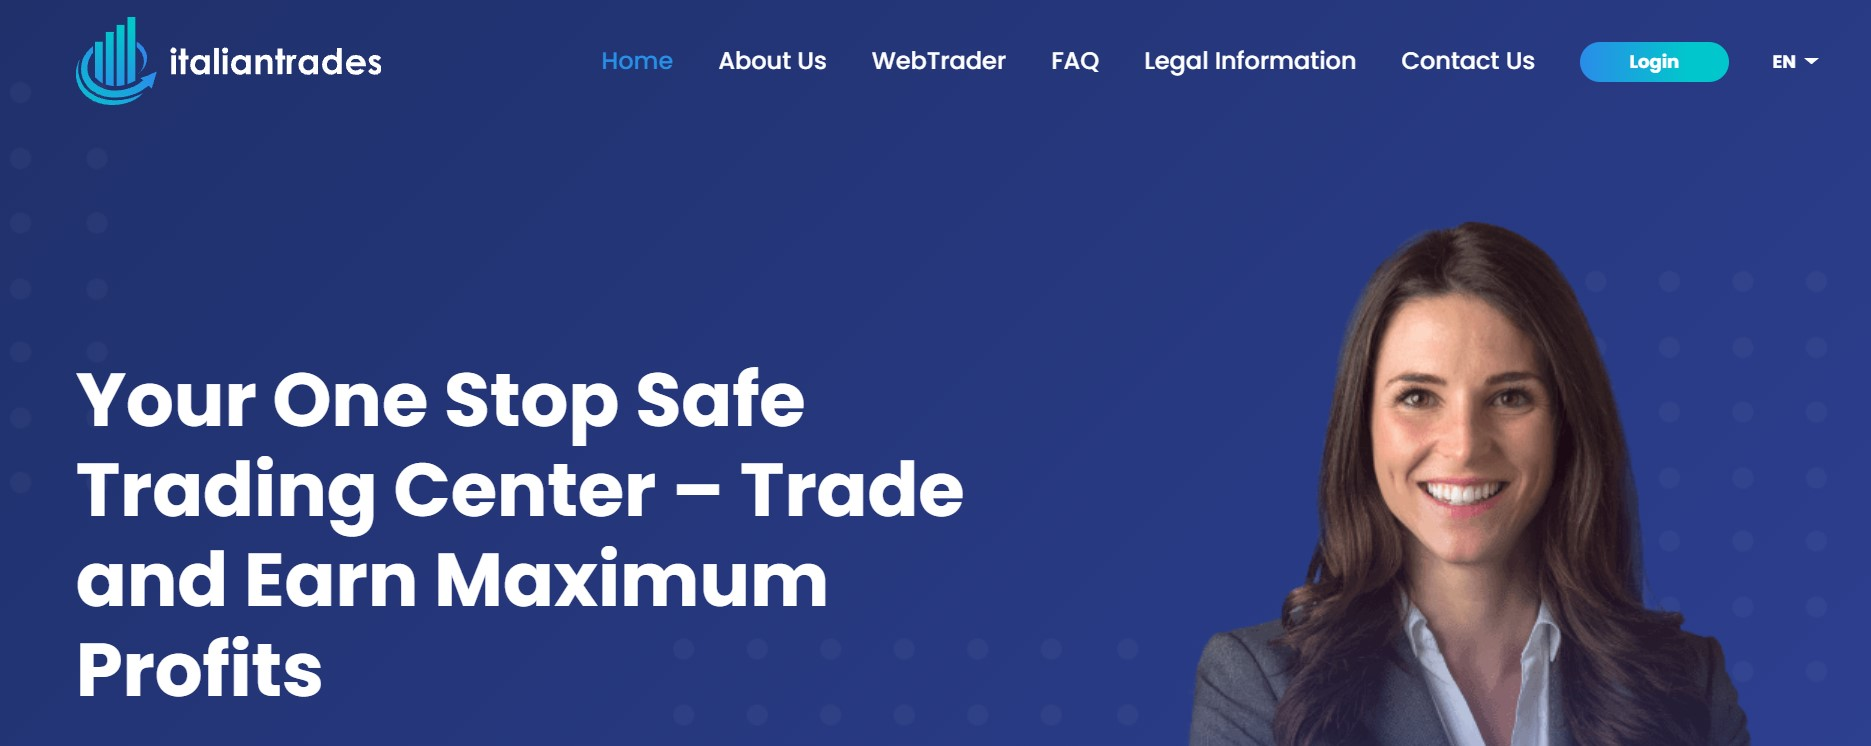 Italiantrades website